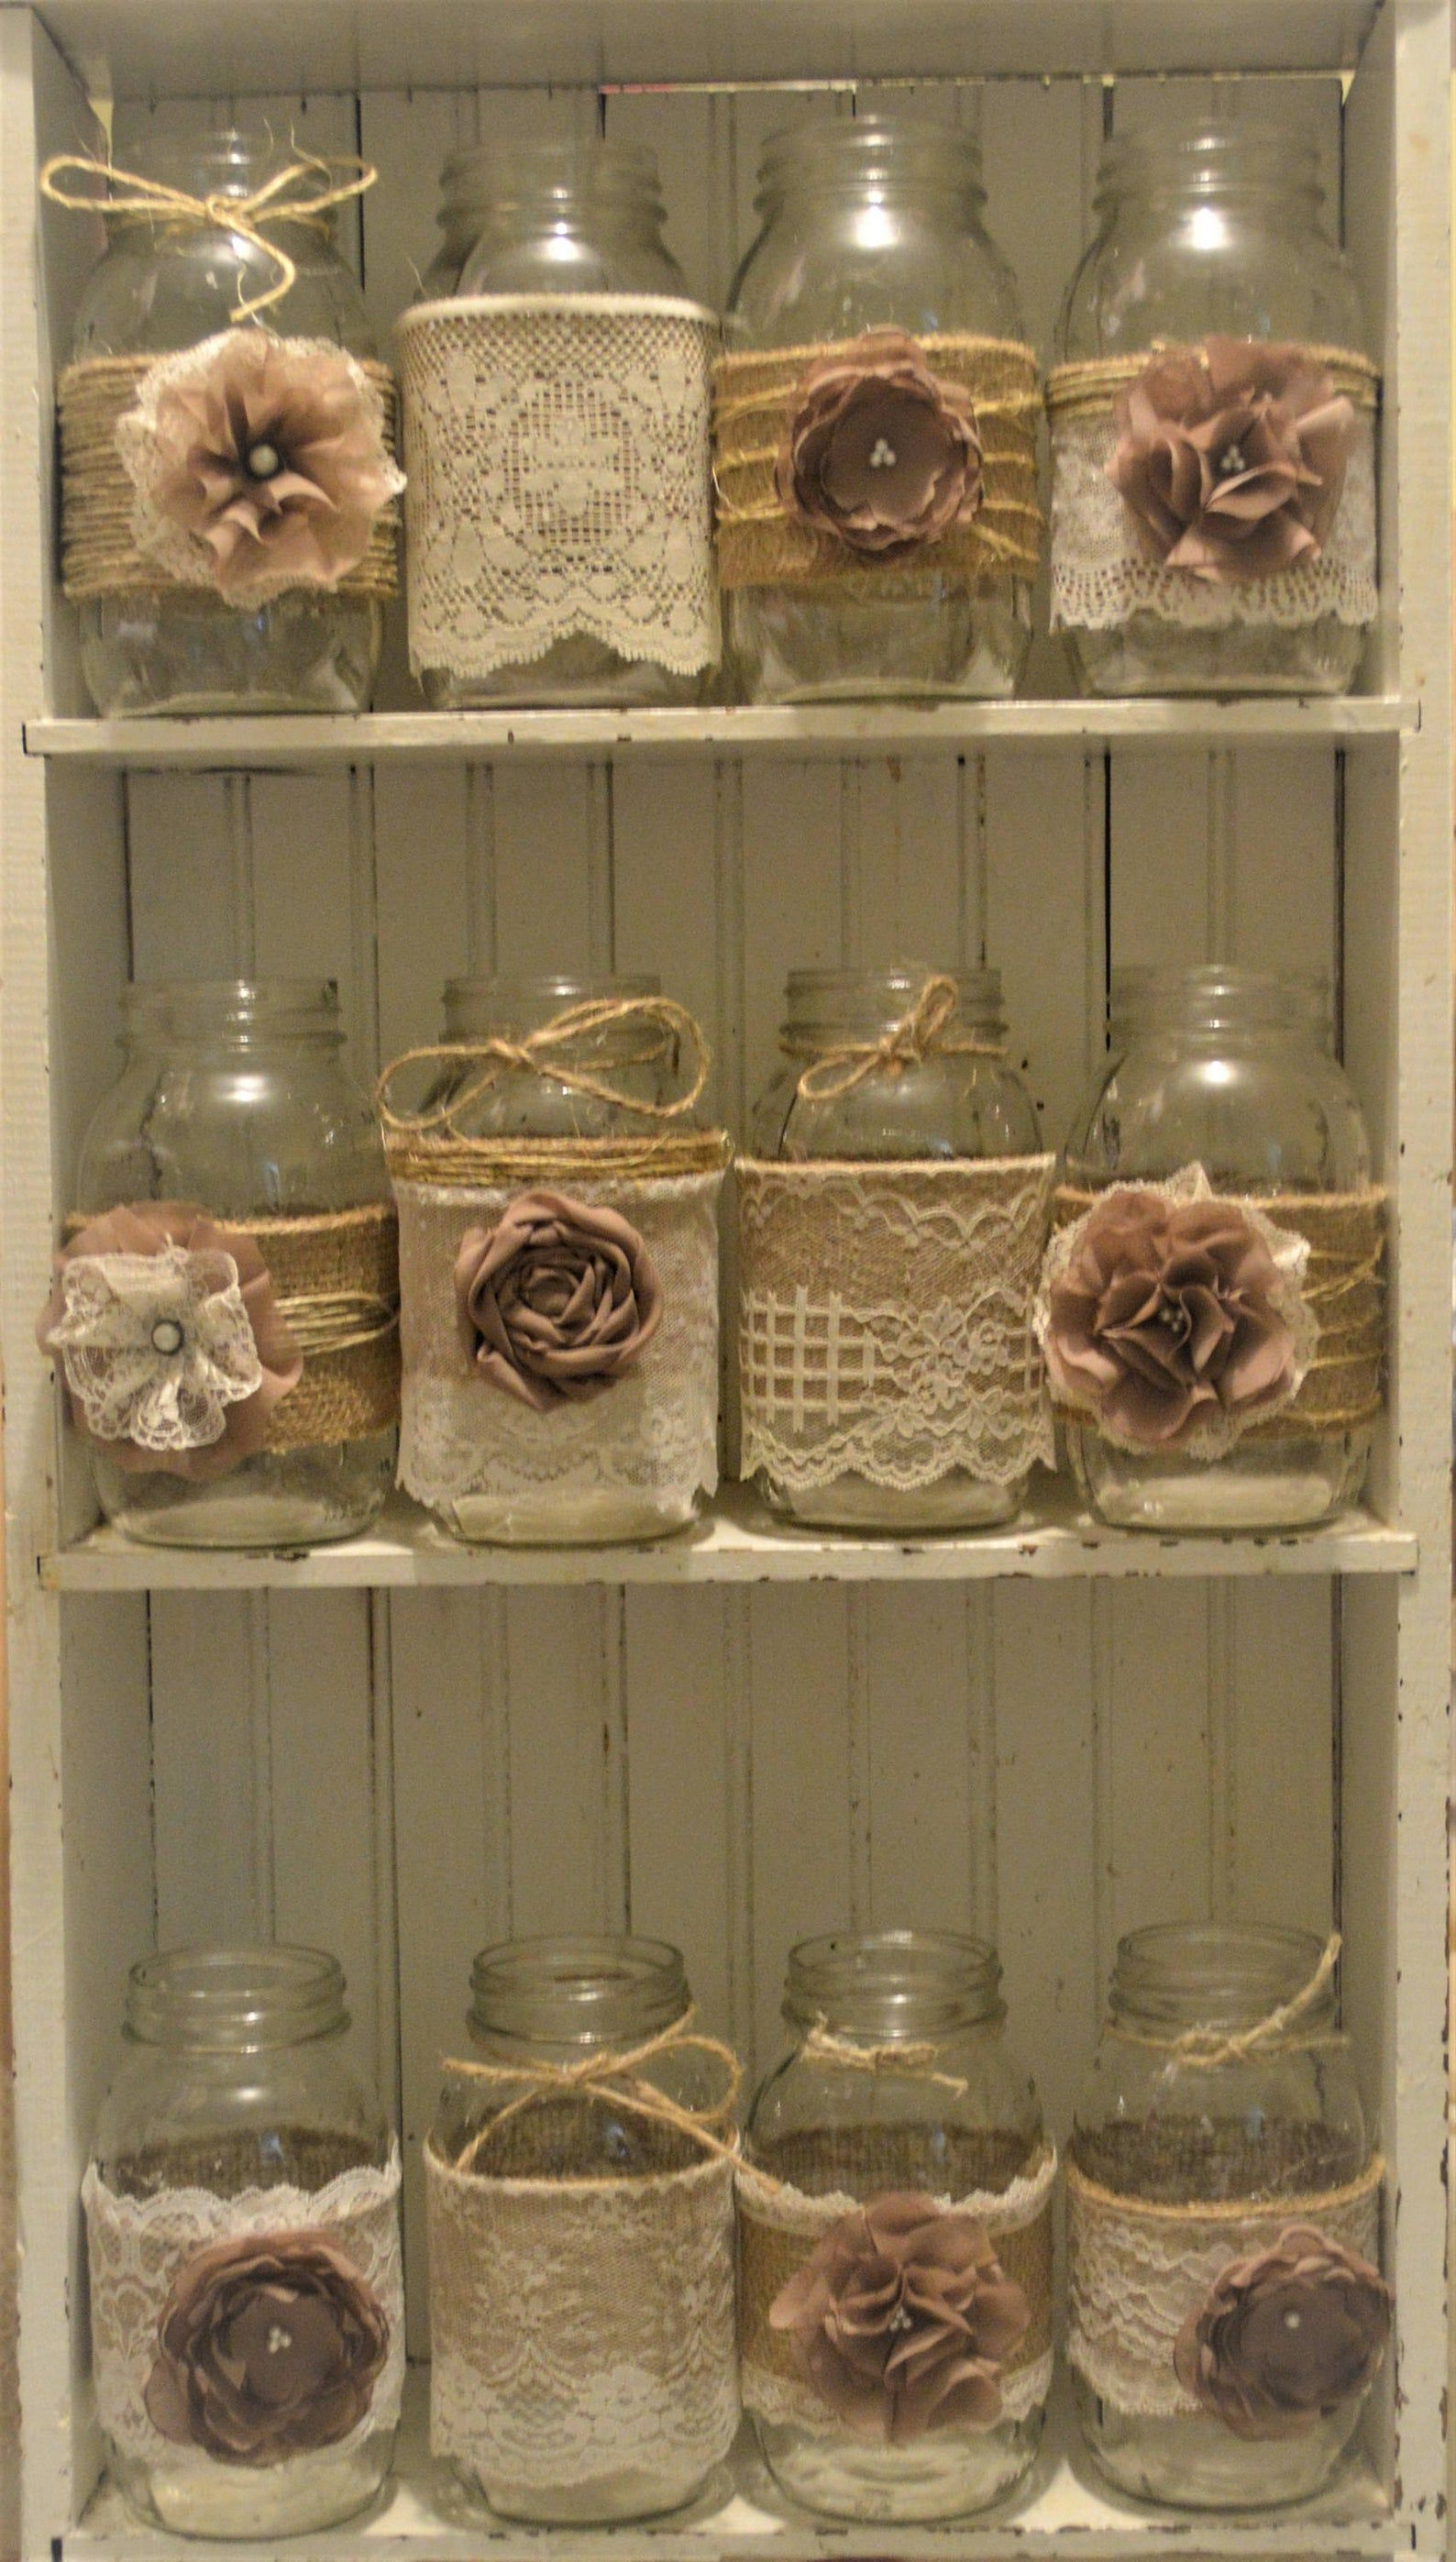 12 Mason Jar Wedding Centerpieces, Rustic Wedding,